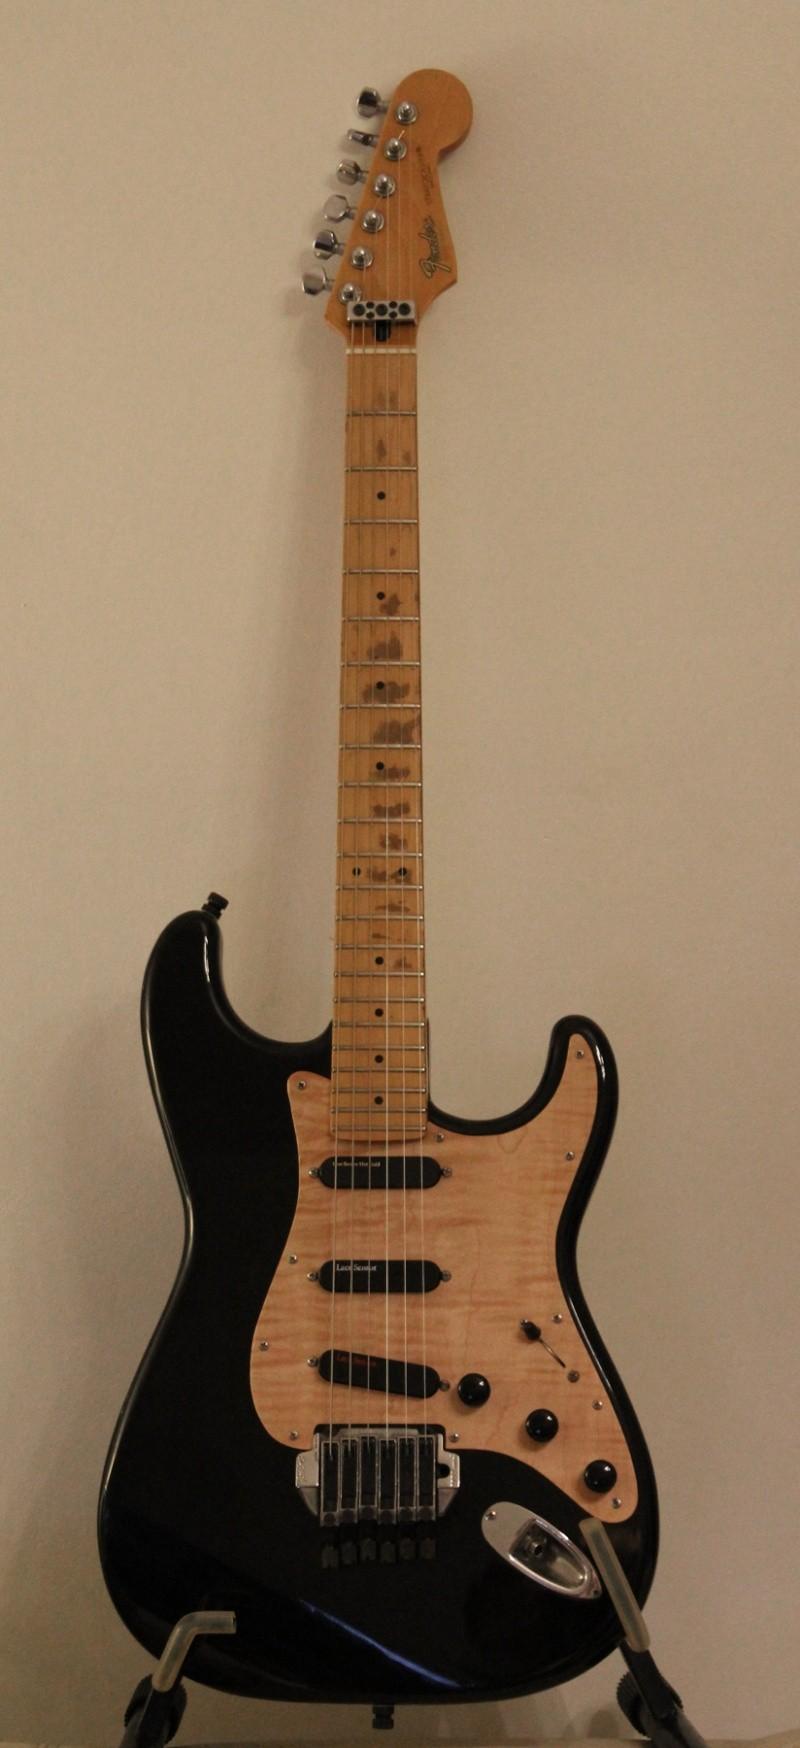 Photos de vos guitares. - Page 39 Strat_10